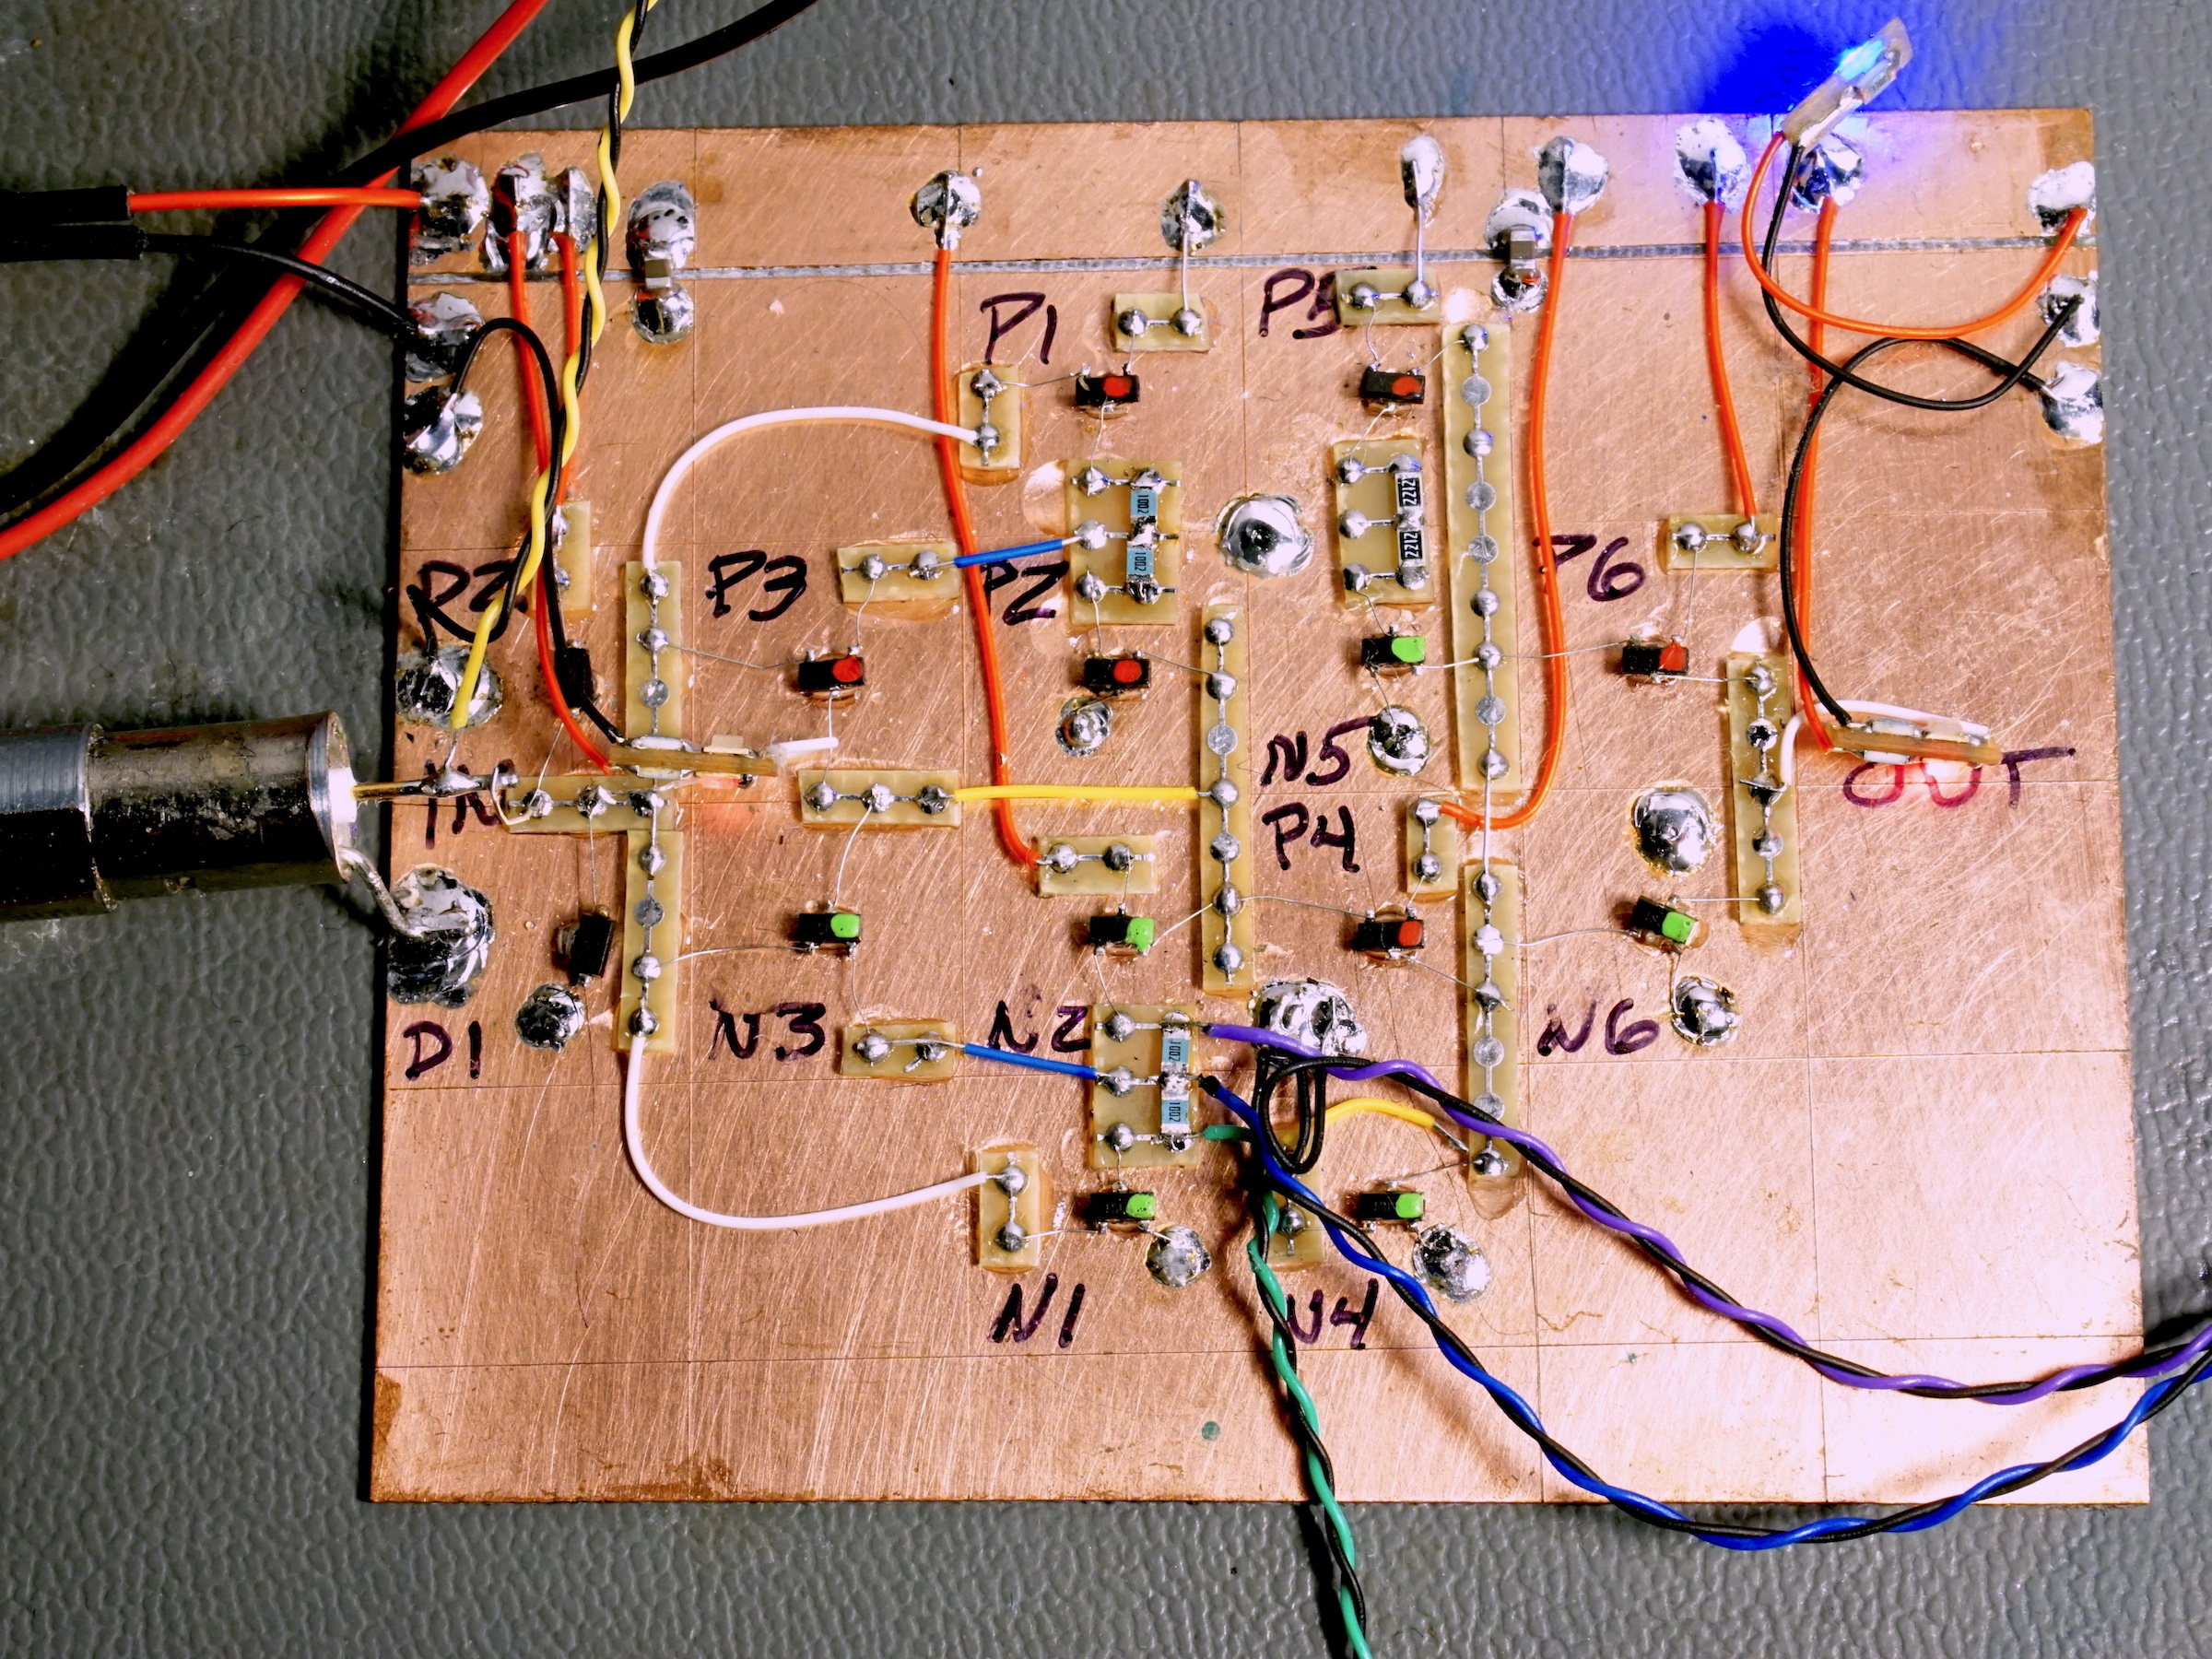 components_CMOS-B-N1-N2.jpg